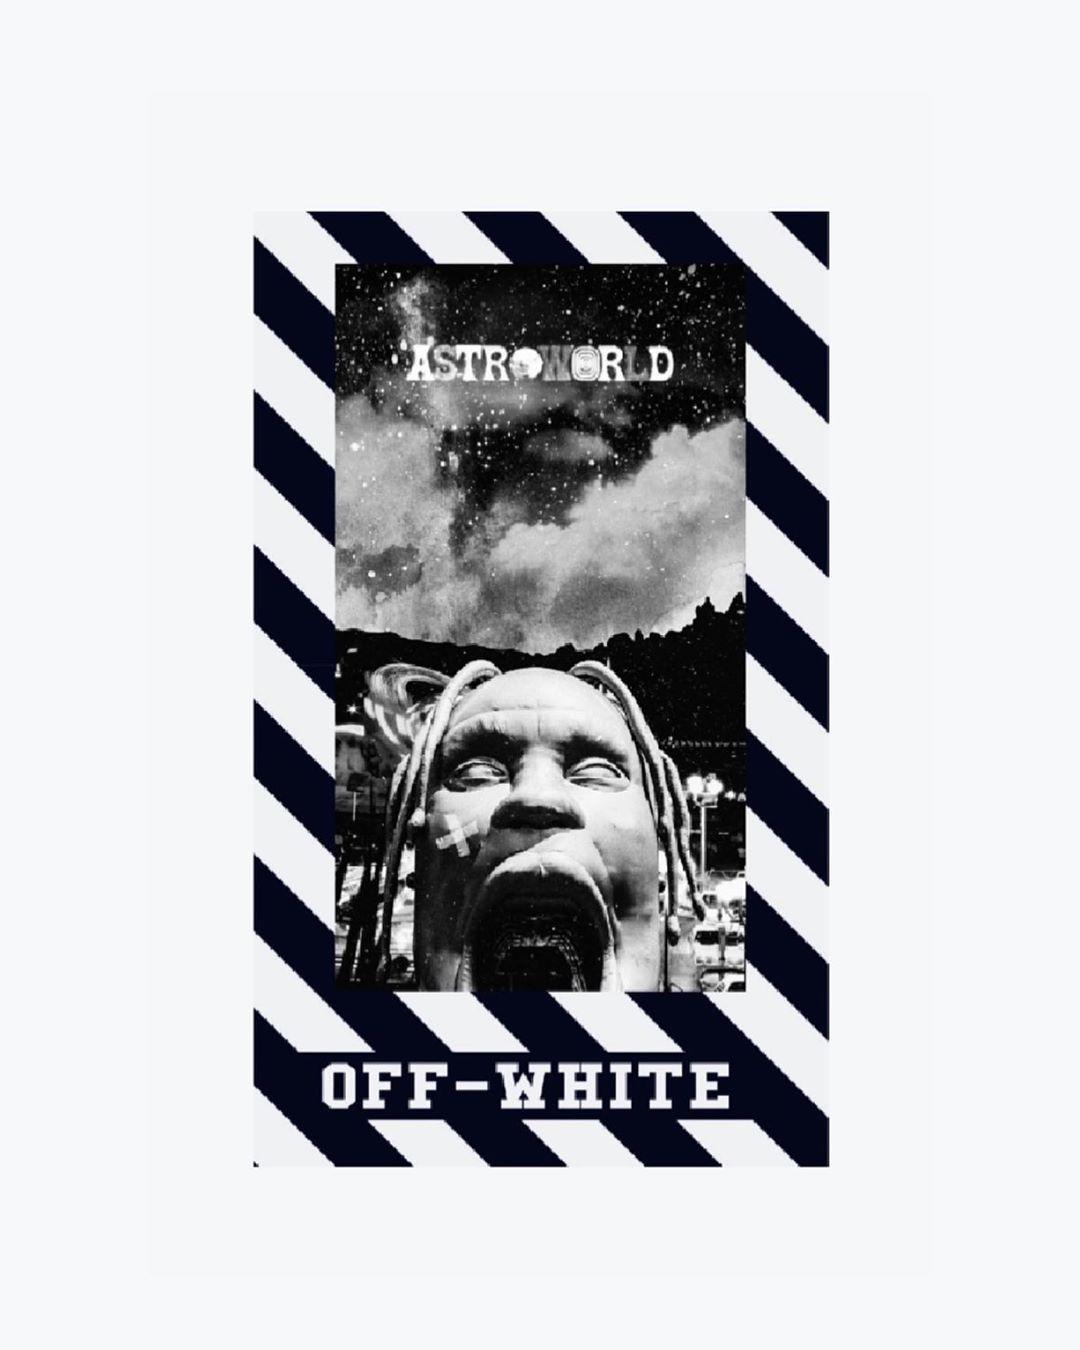 First Wallpaper Wallpaper Wallpapers Travisscott Offwhite Astroworld Astroworldtour Cool Art Blackandwhite Backg In 2020 Background S Wallpaper Wallpaper S